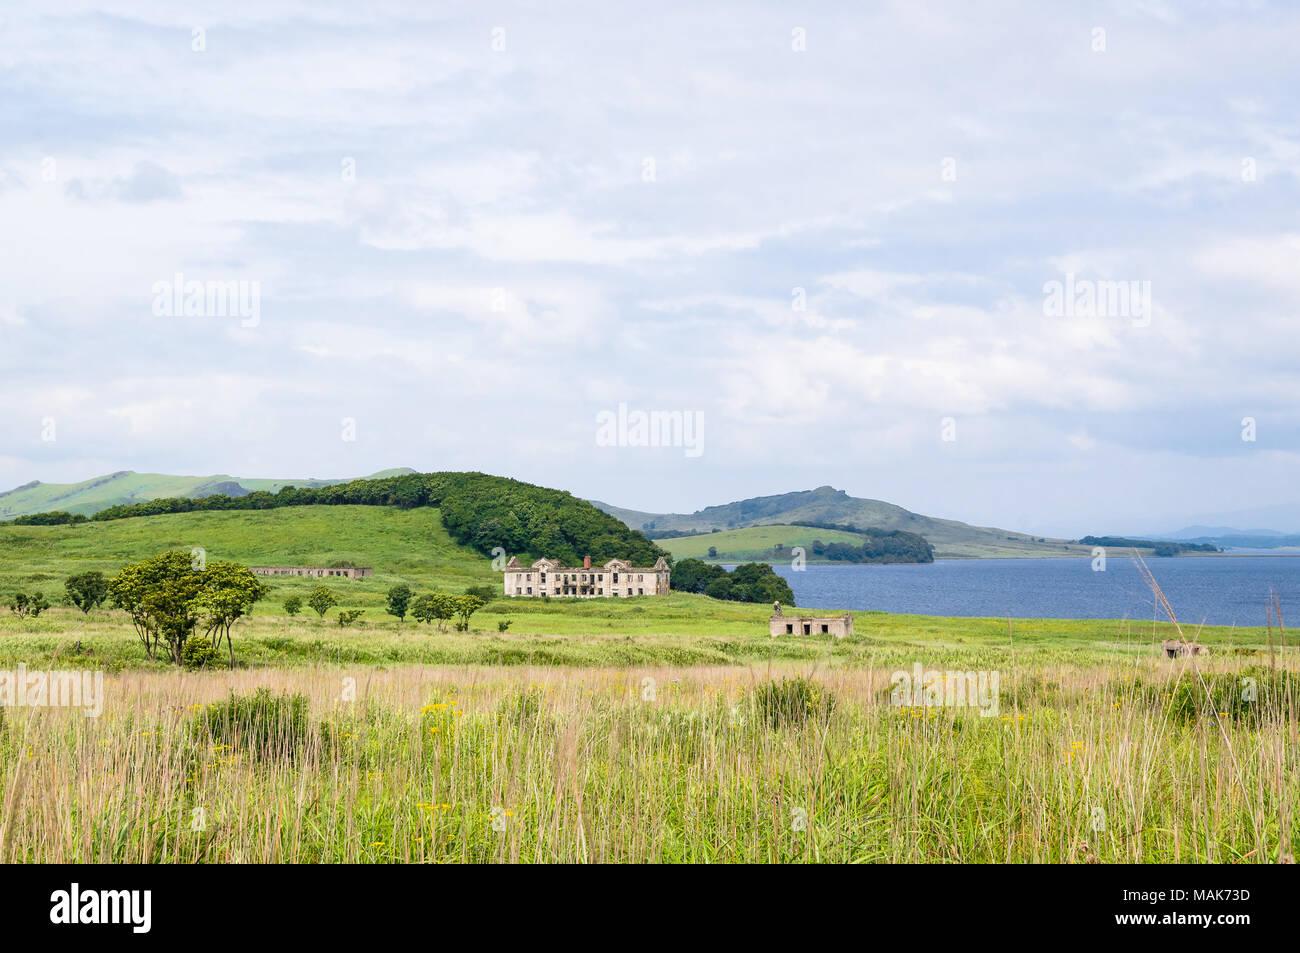 The Far Eastern landscape of the Krabbe Peninsula - Stock Image